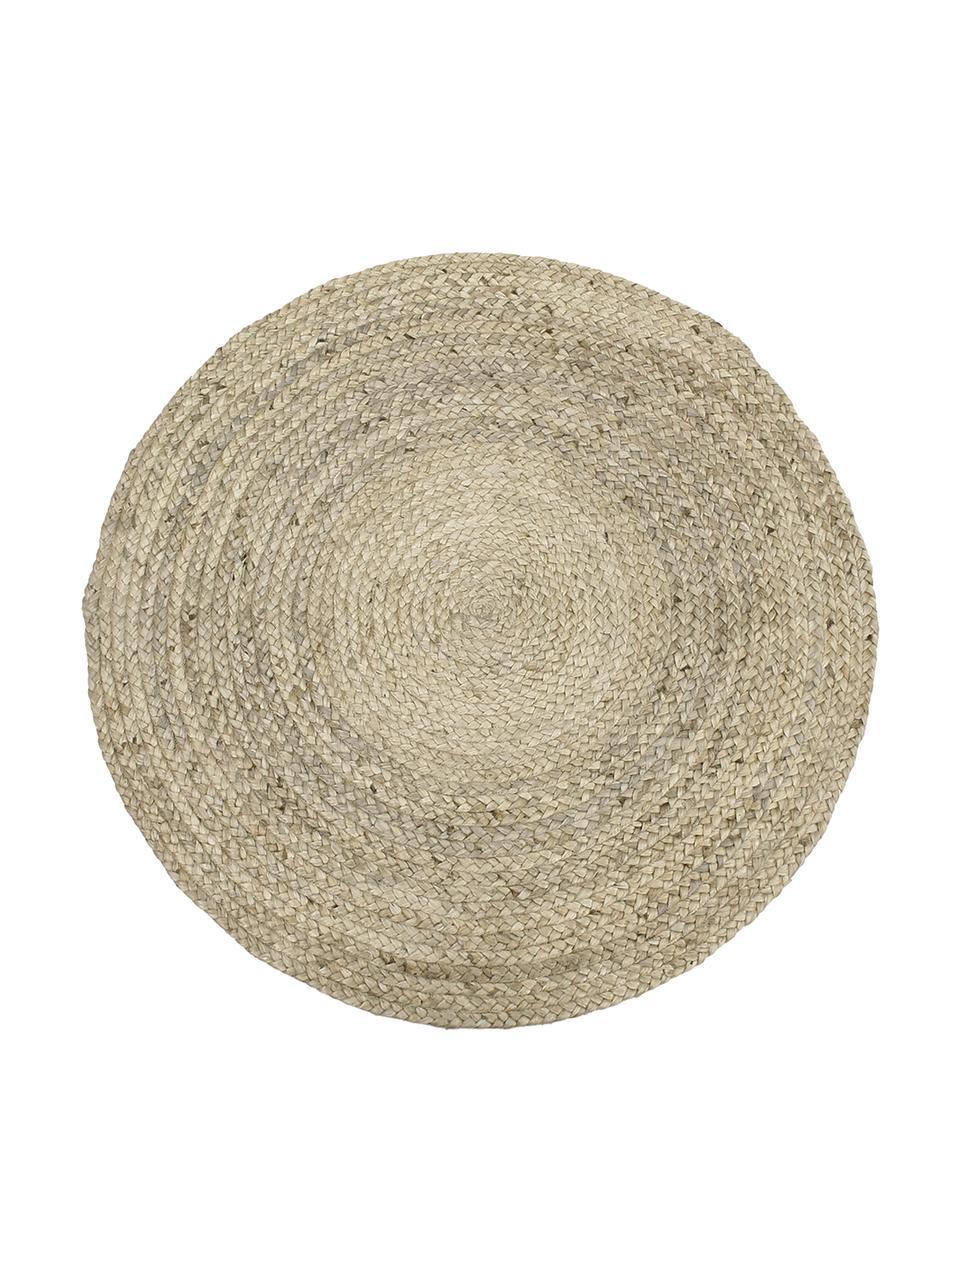 tapis rond beige en jute fait main sharmila